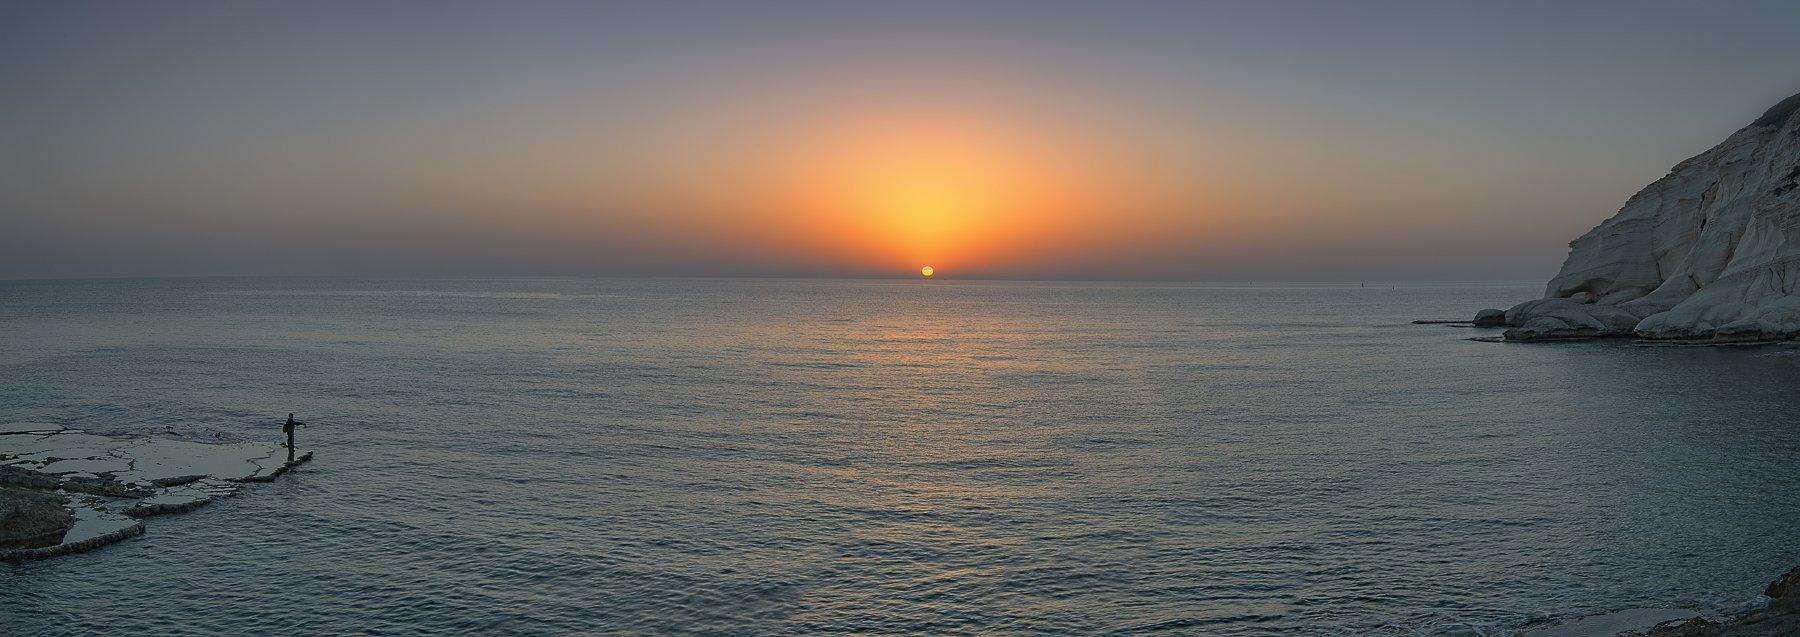 Закат солнце море скала Рош Аникра , Яновский Михаил